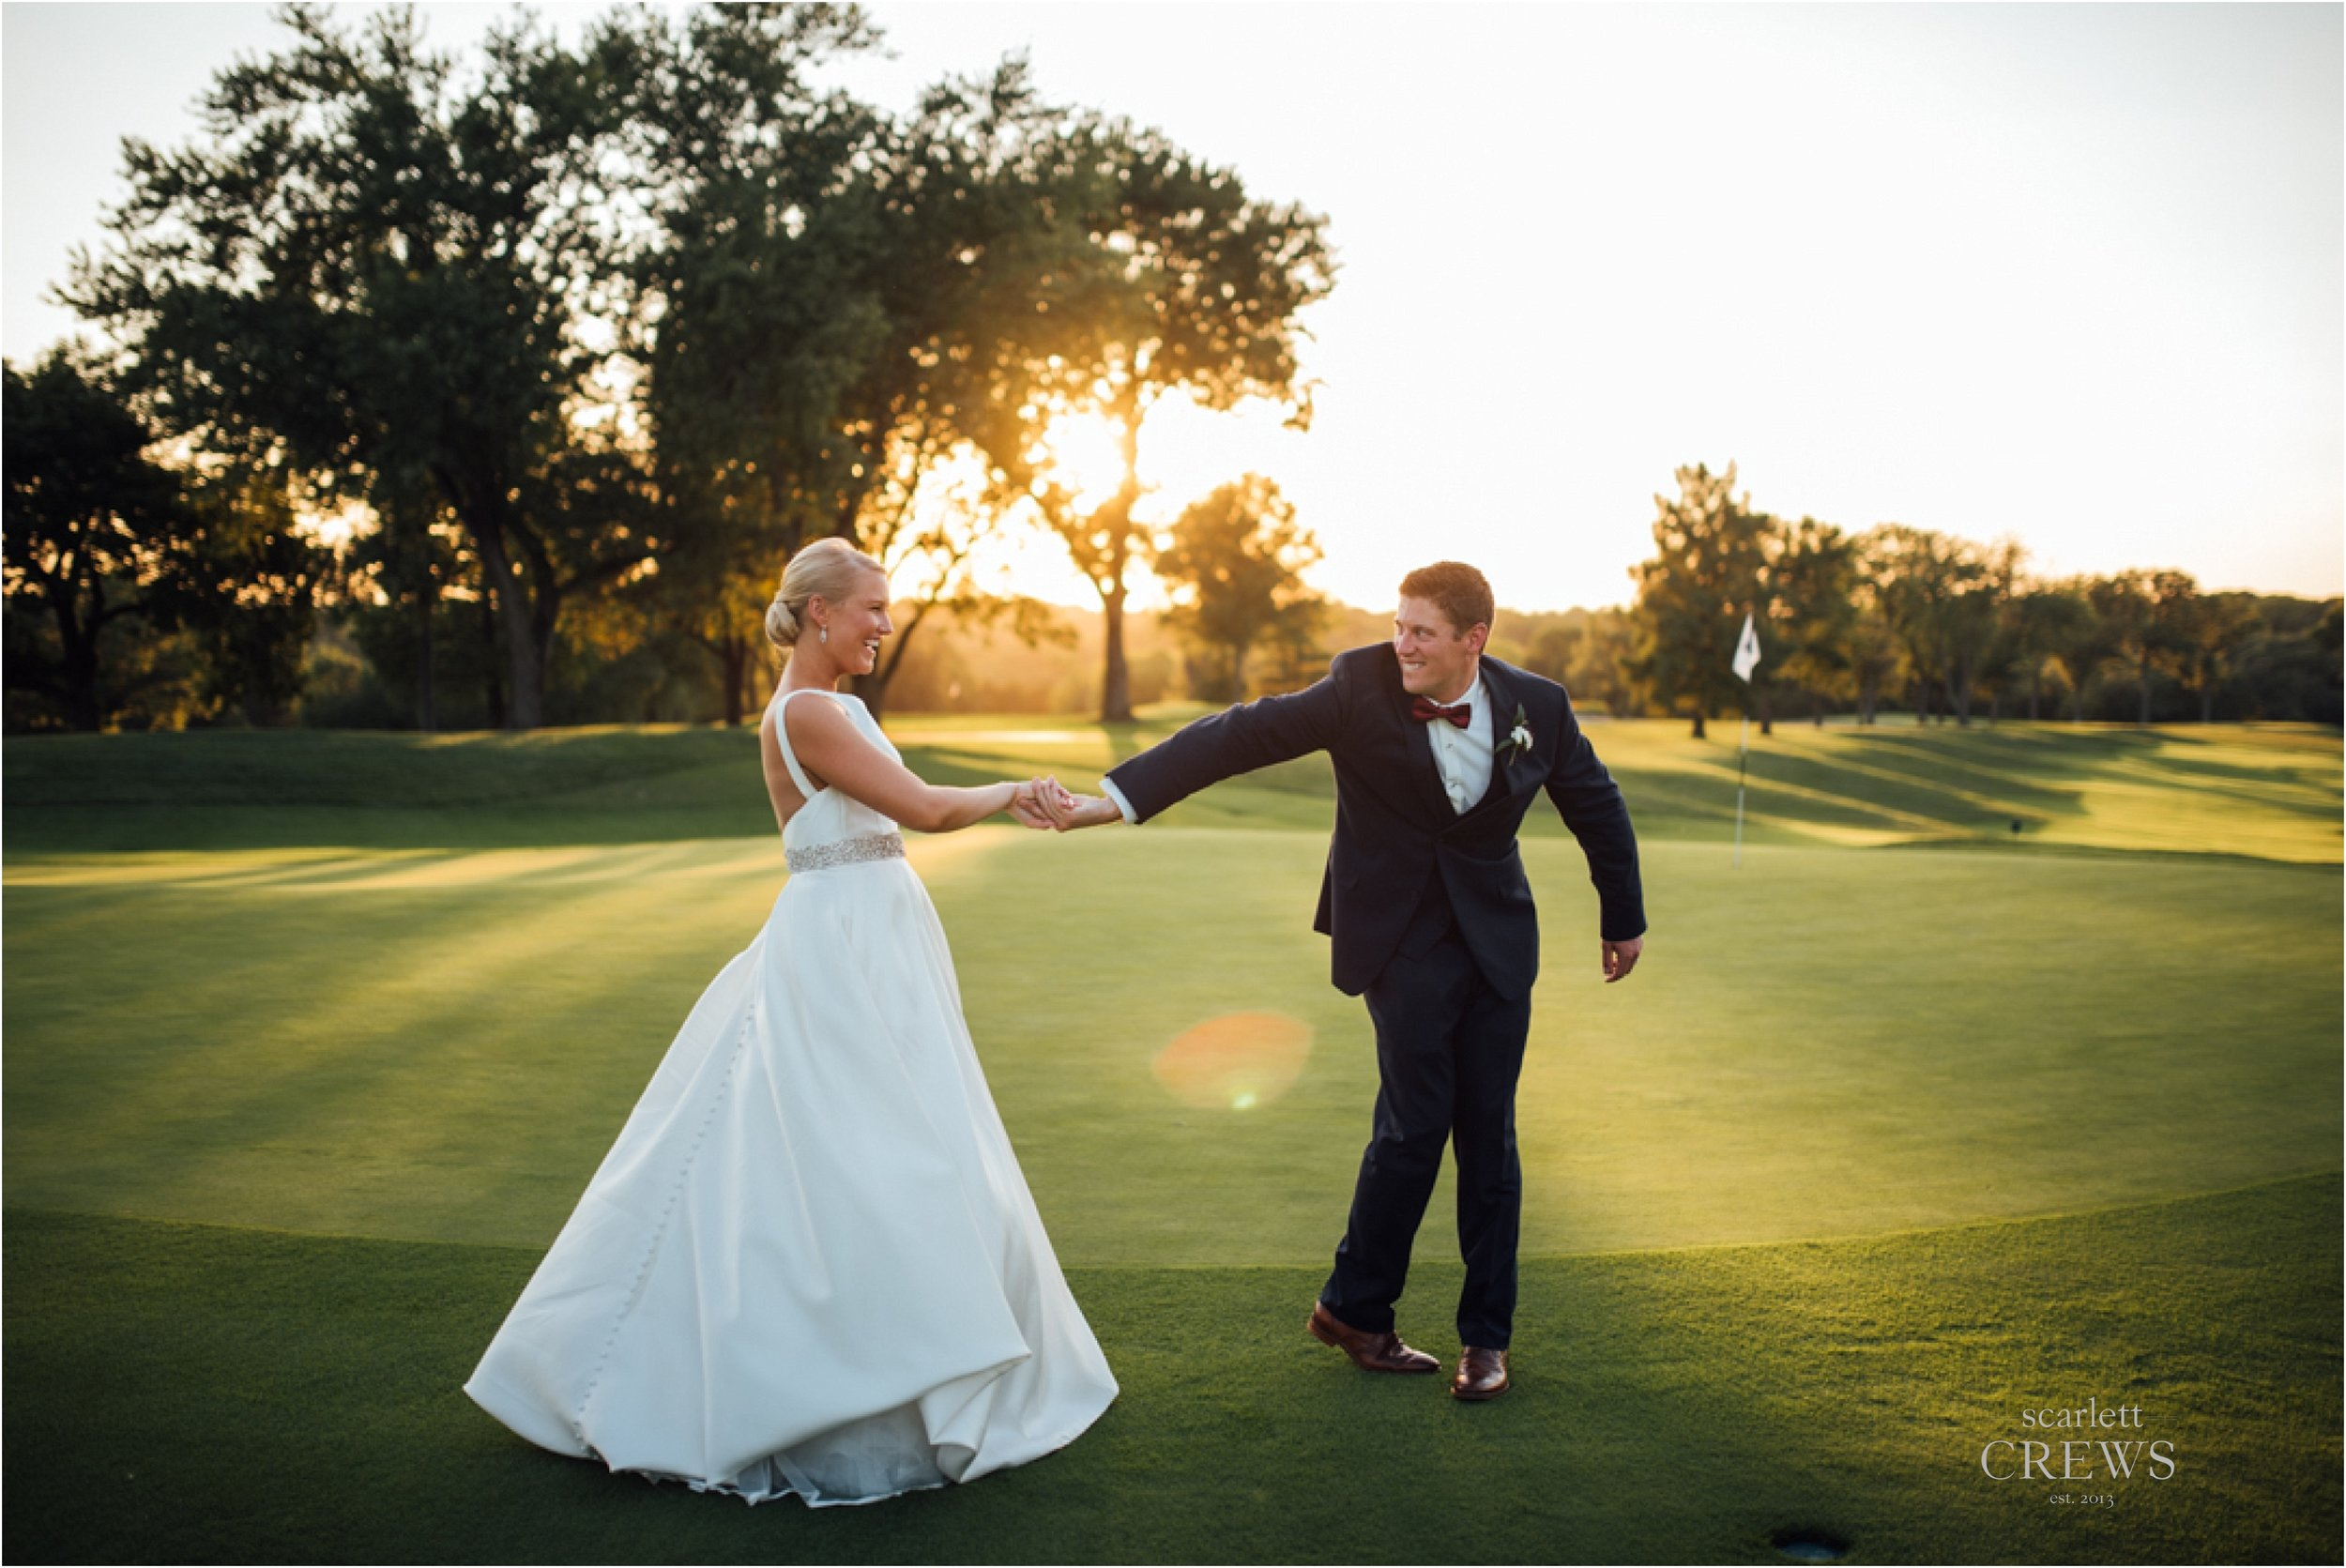 Sunset Country Club Wedding Juliette & Tim35.jpg